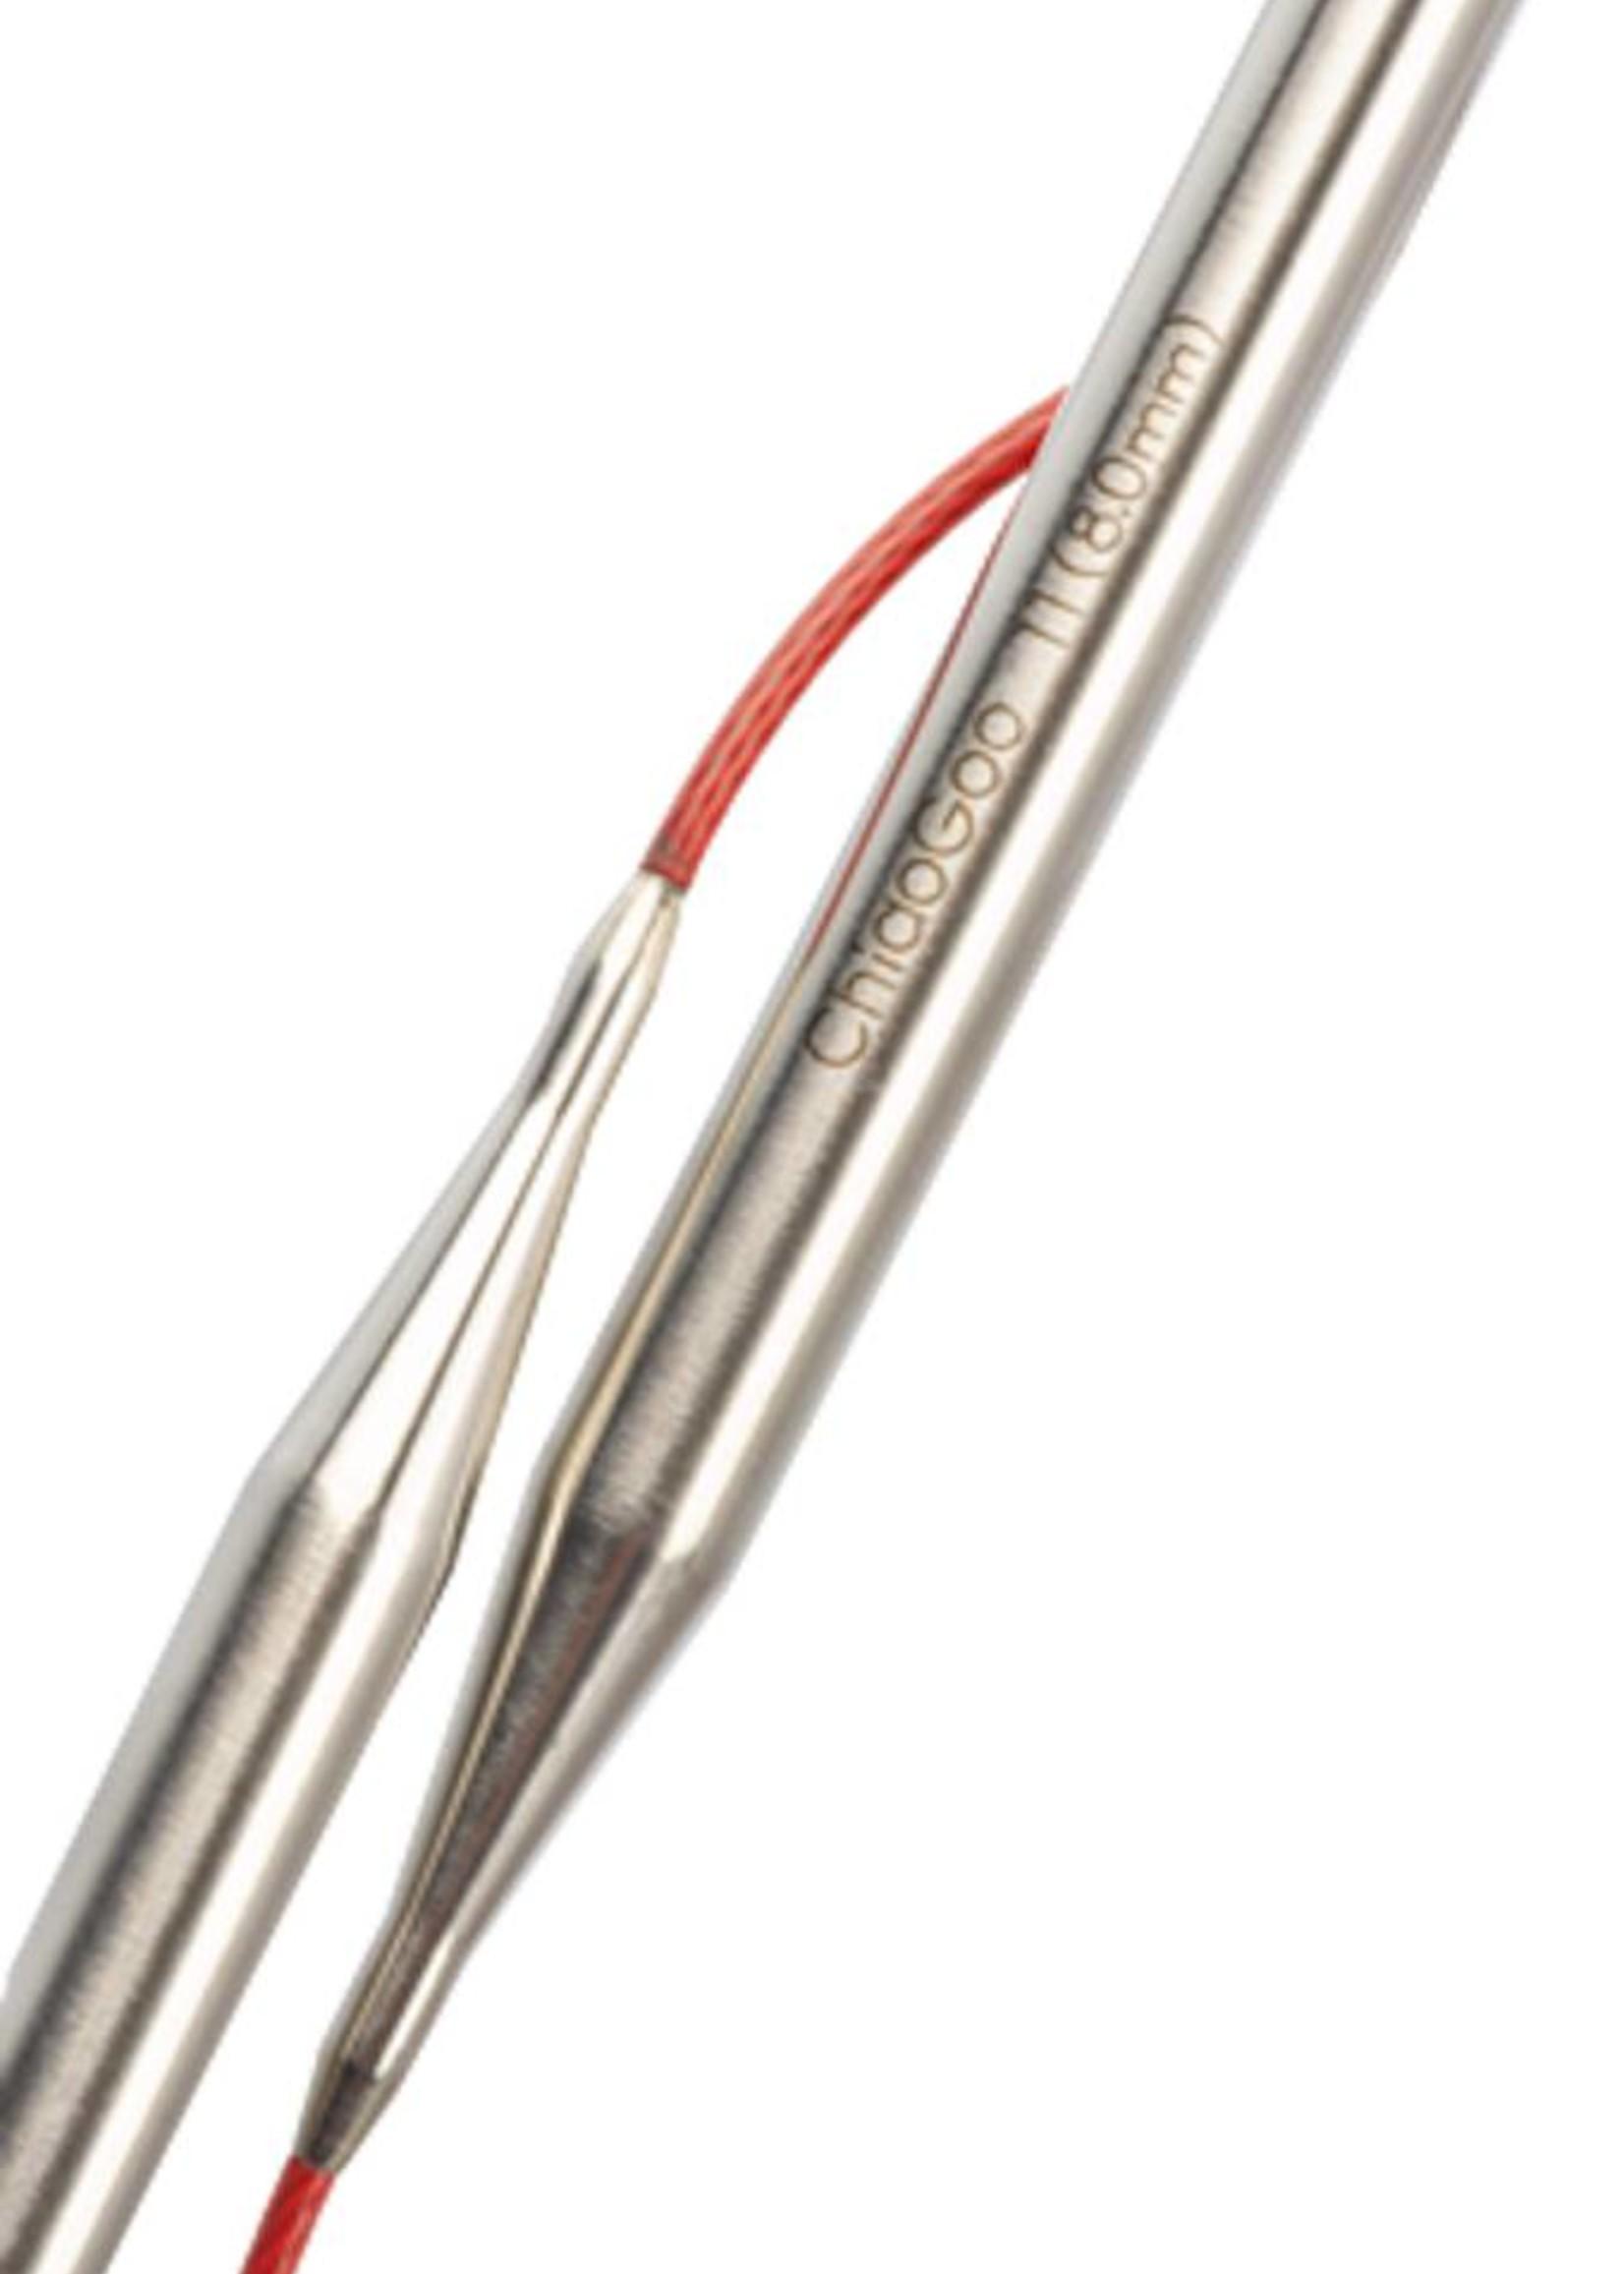 ChiaoGoo Chiao Goo Red Stainless Steel Fixed Circular